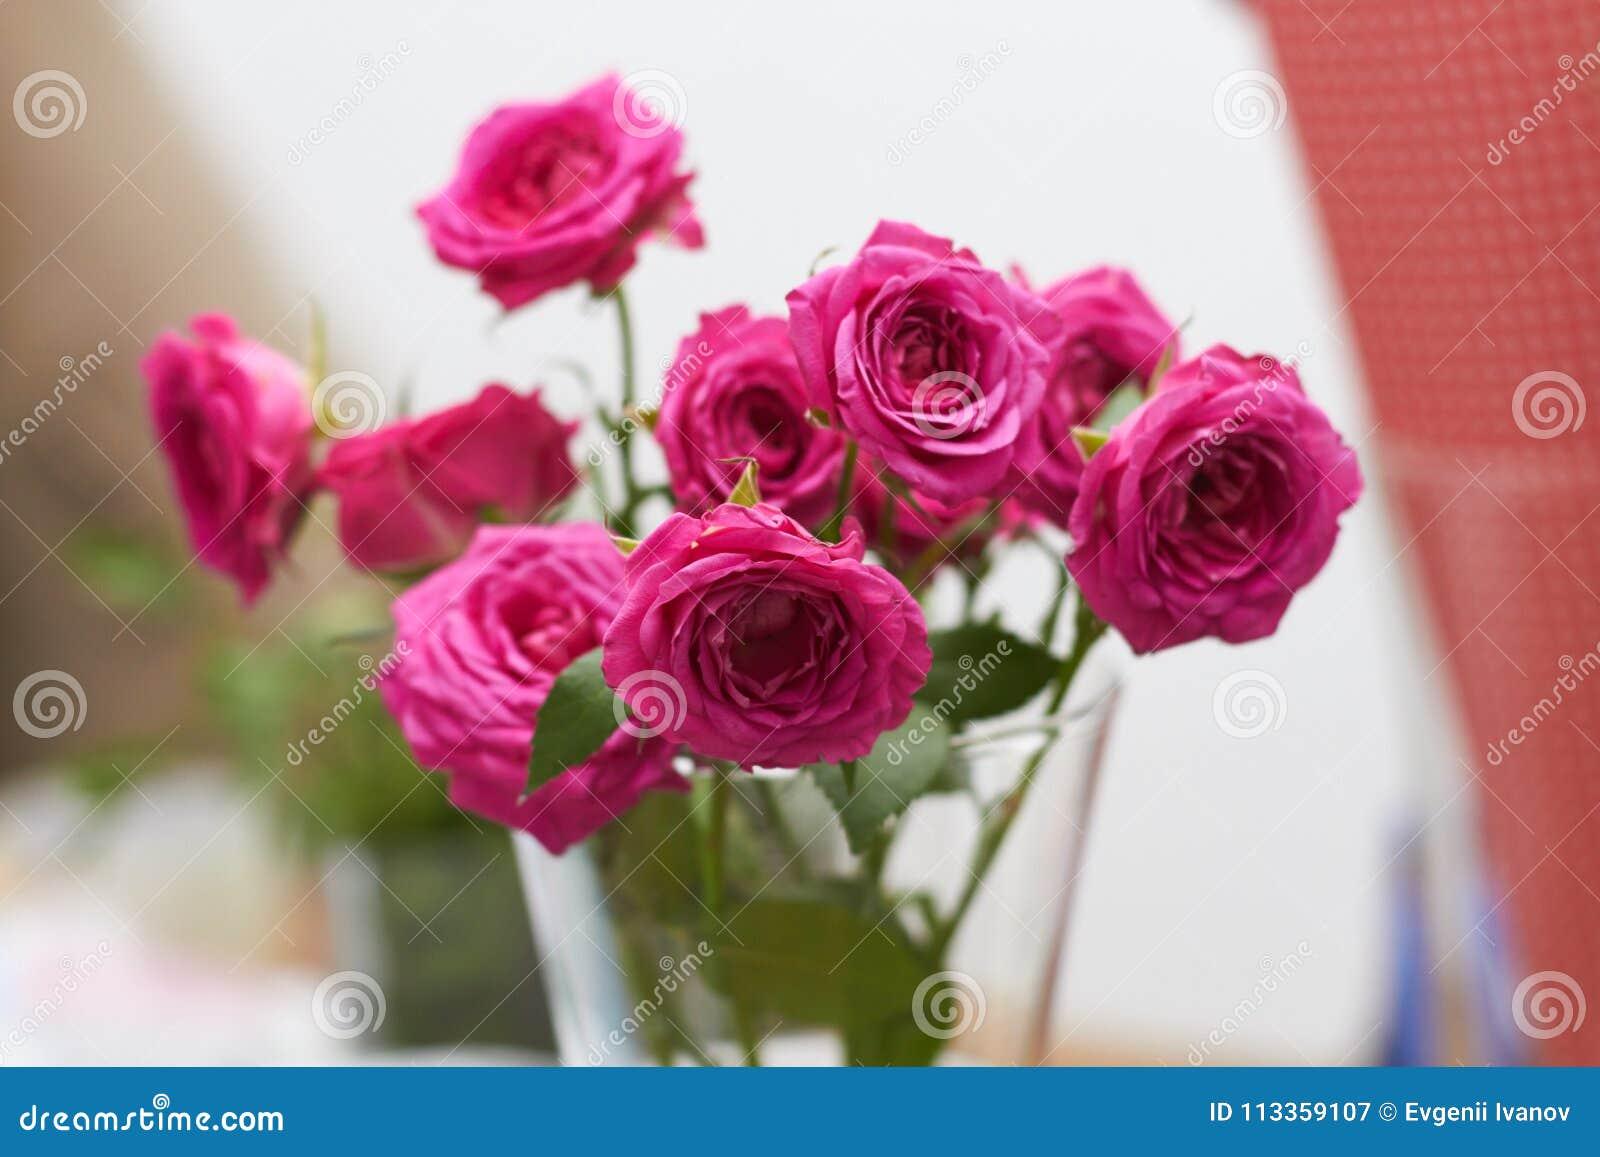 Making a beautiful little summer bouquet of flowers with their o download making a beautiful little summer bouquet of flowers with their o stock image image izmirmasajfo